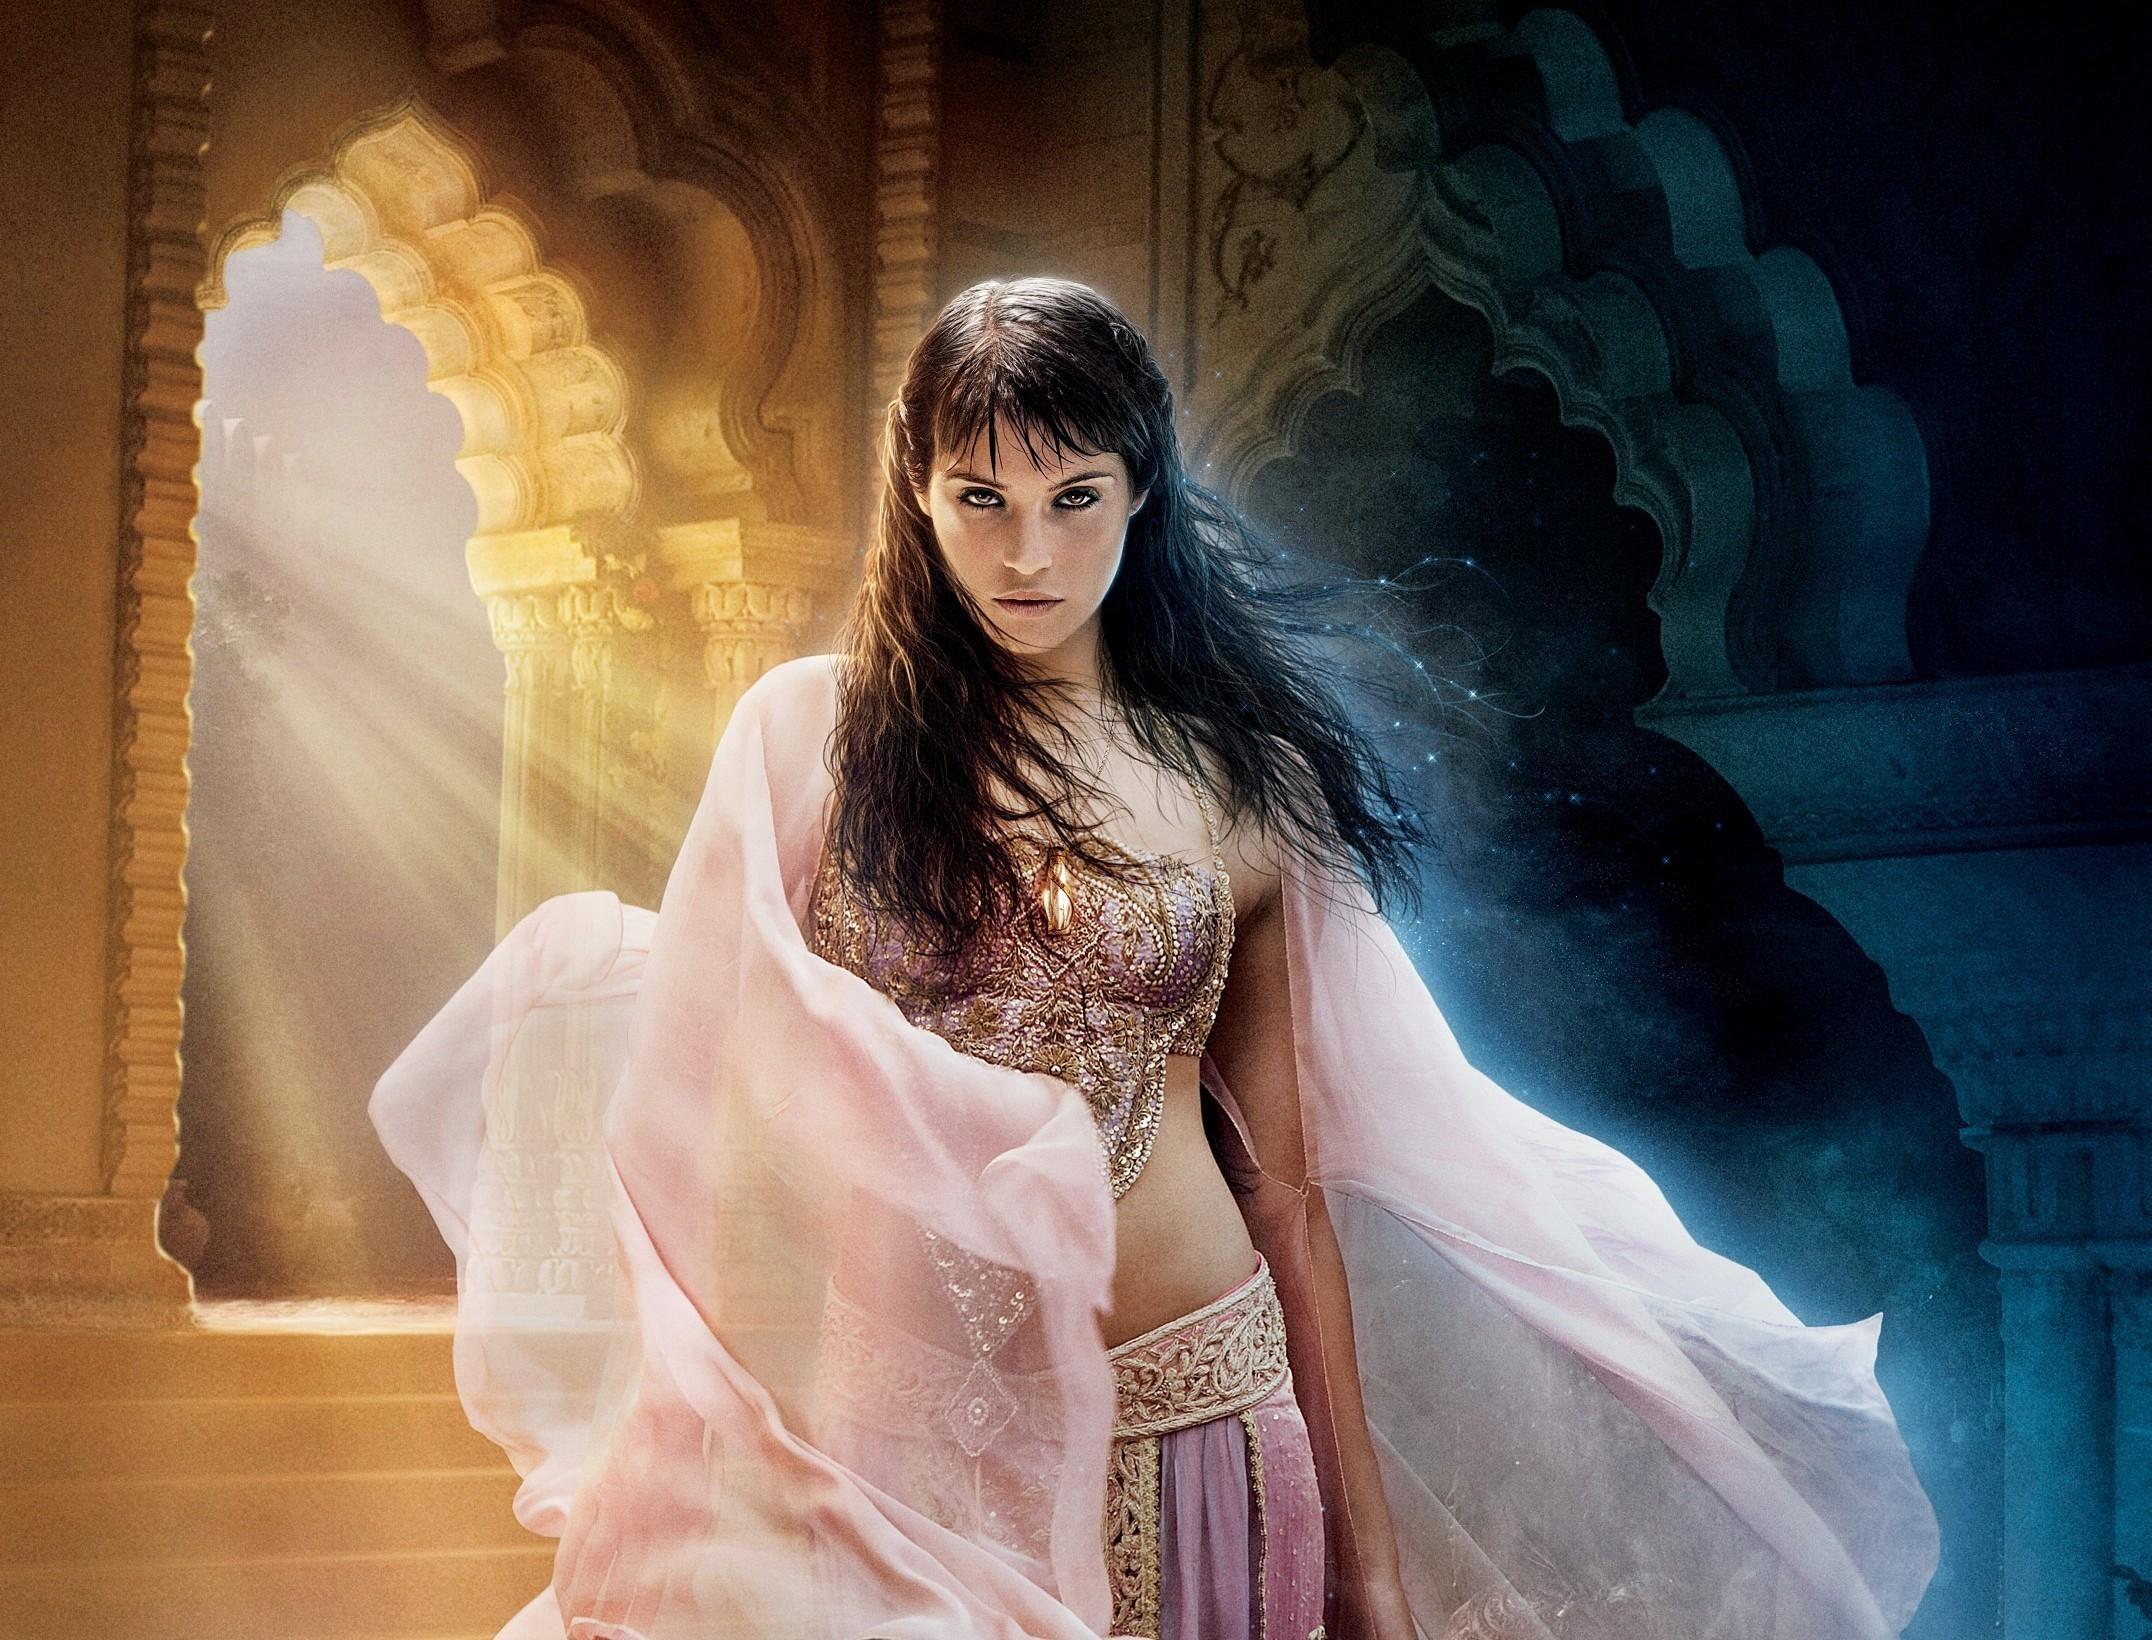 Amazing Wallpaper Movie Prince Persia - 118614  Photograph_108792.jpg